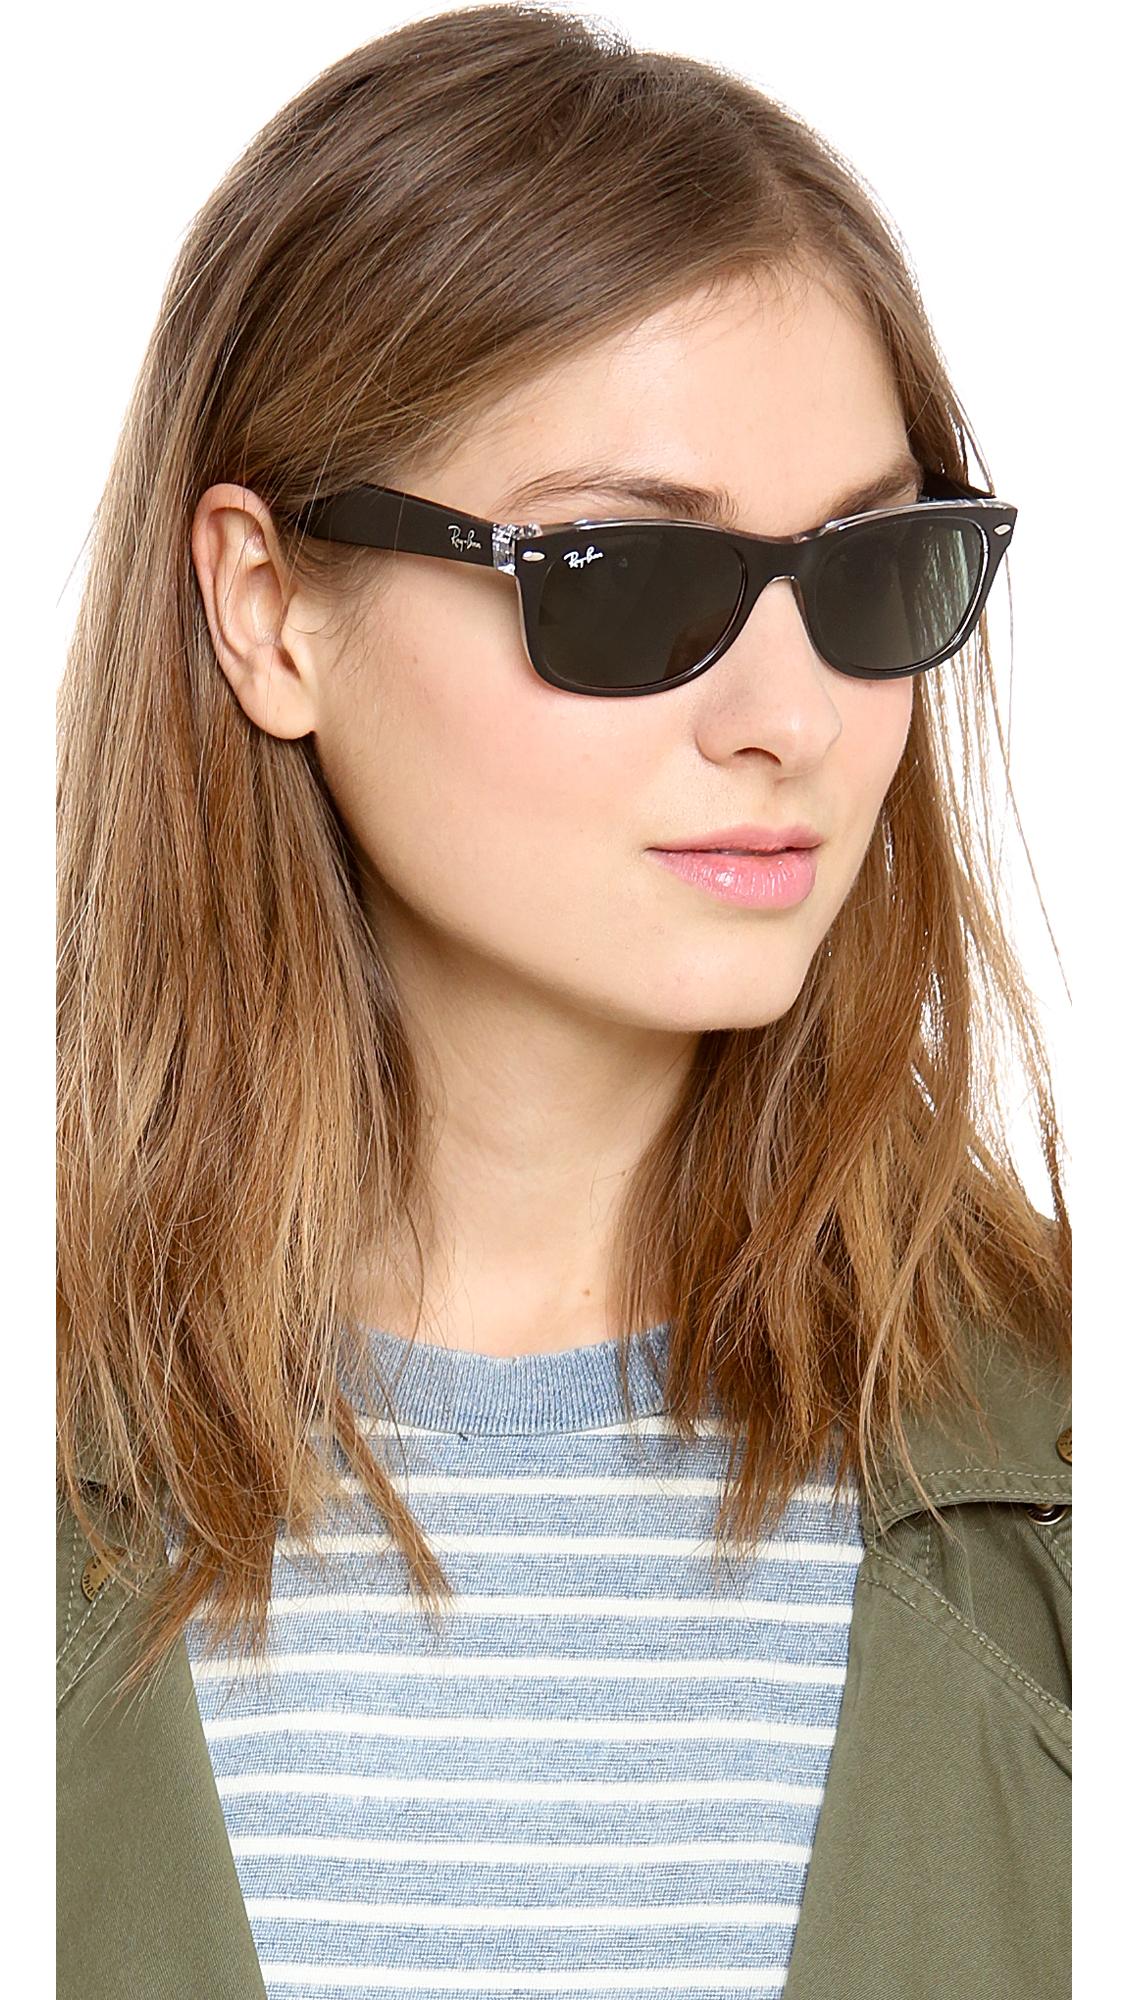 2a0300d695d6 Ray-Ban New Transparent Wayfarer Sunglasses in Black - Lyst